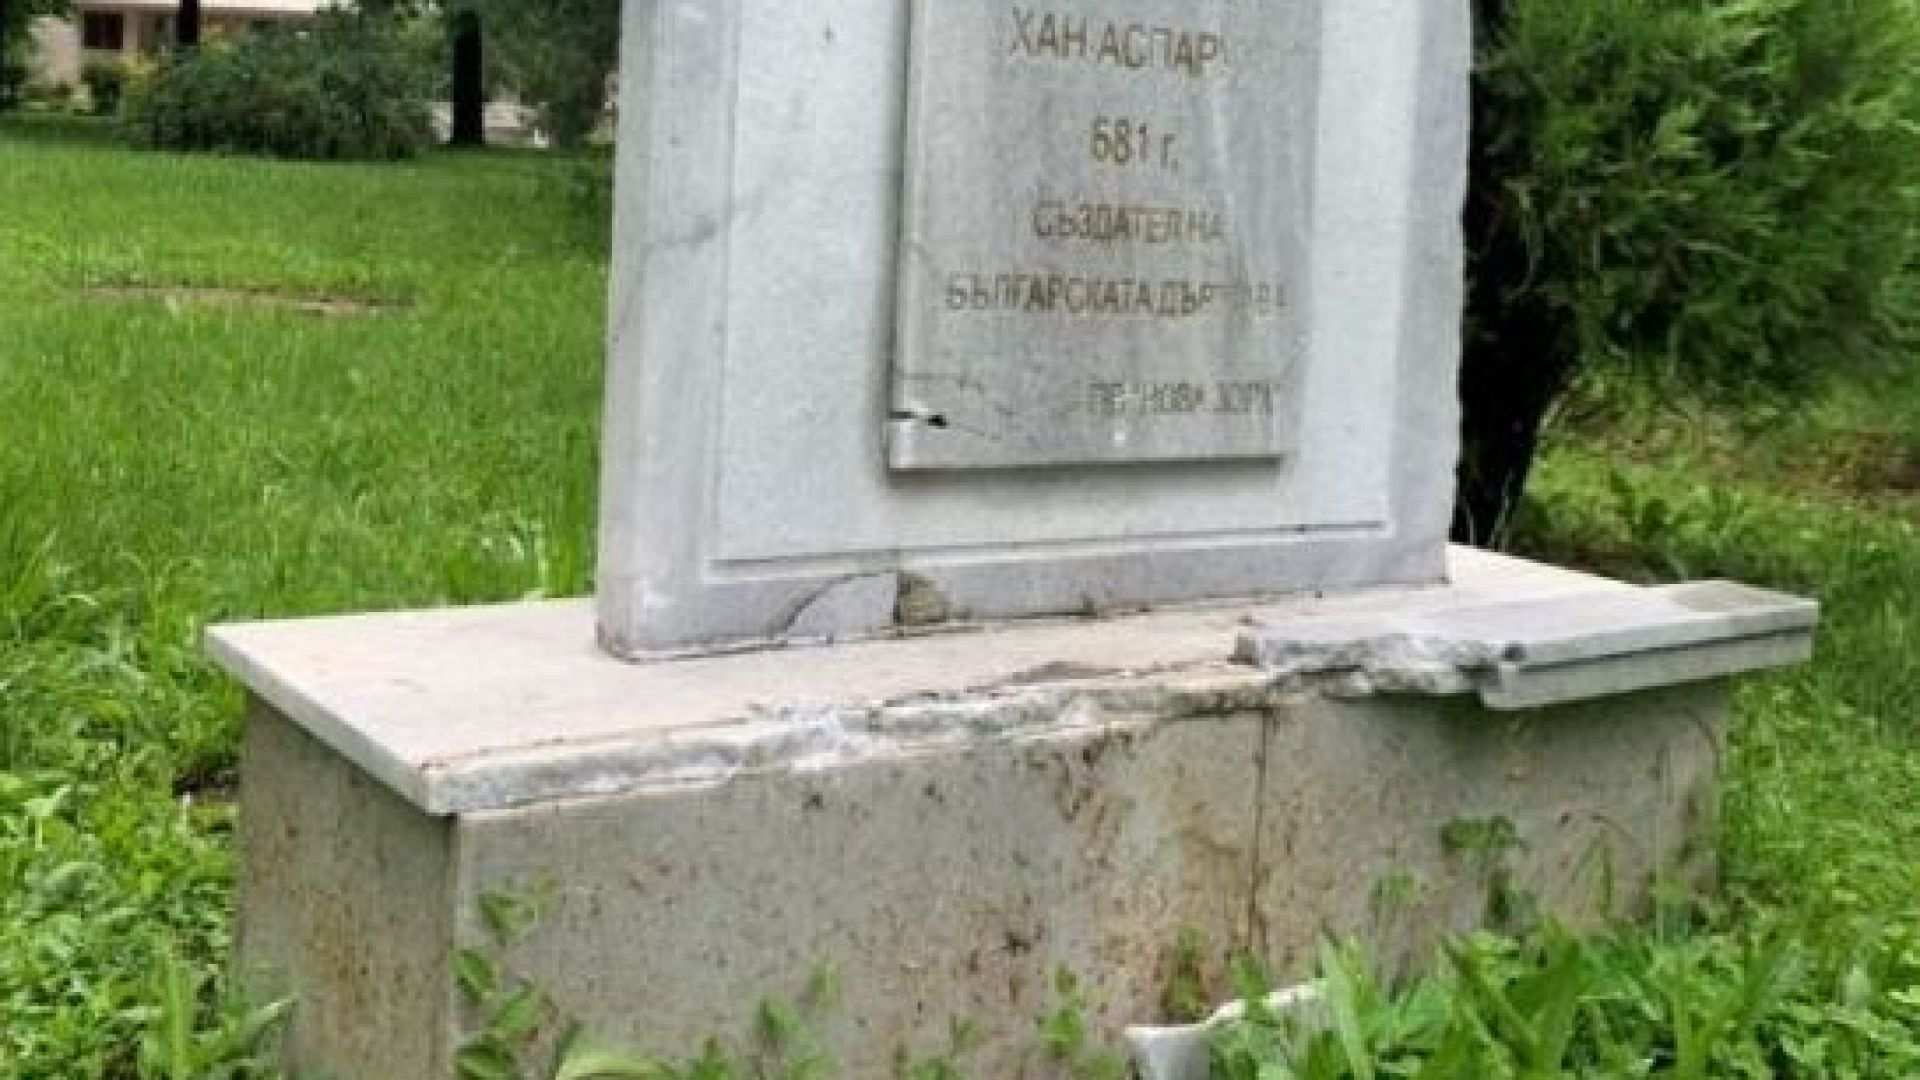 Македонец руши паметник на Хан Аспарух в град Левски